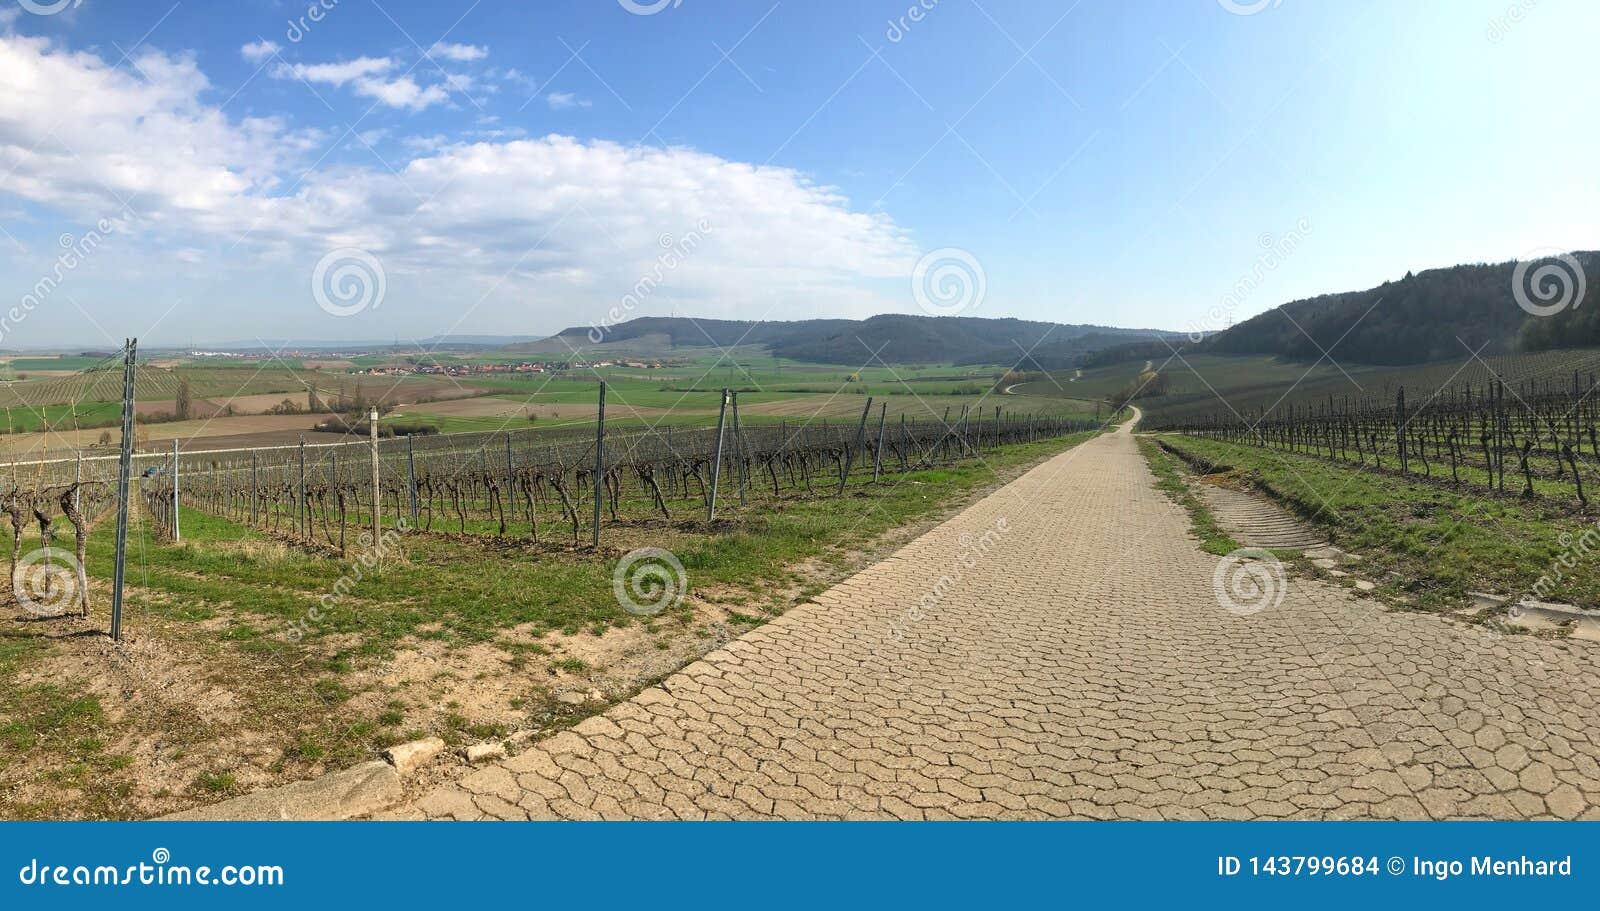 Панорама виноградника в Баварии в предыдущей весне